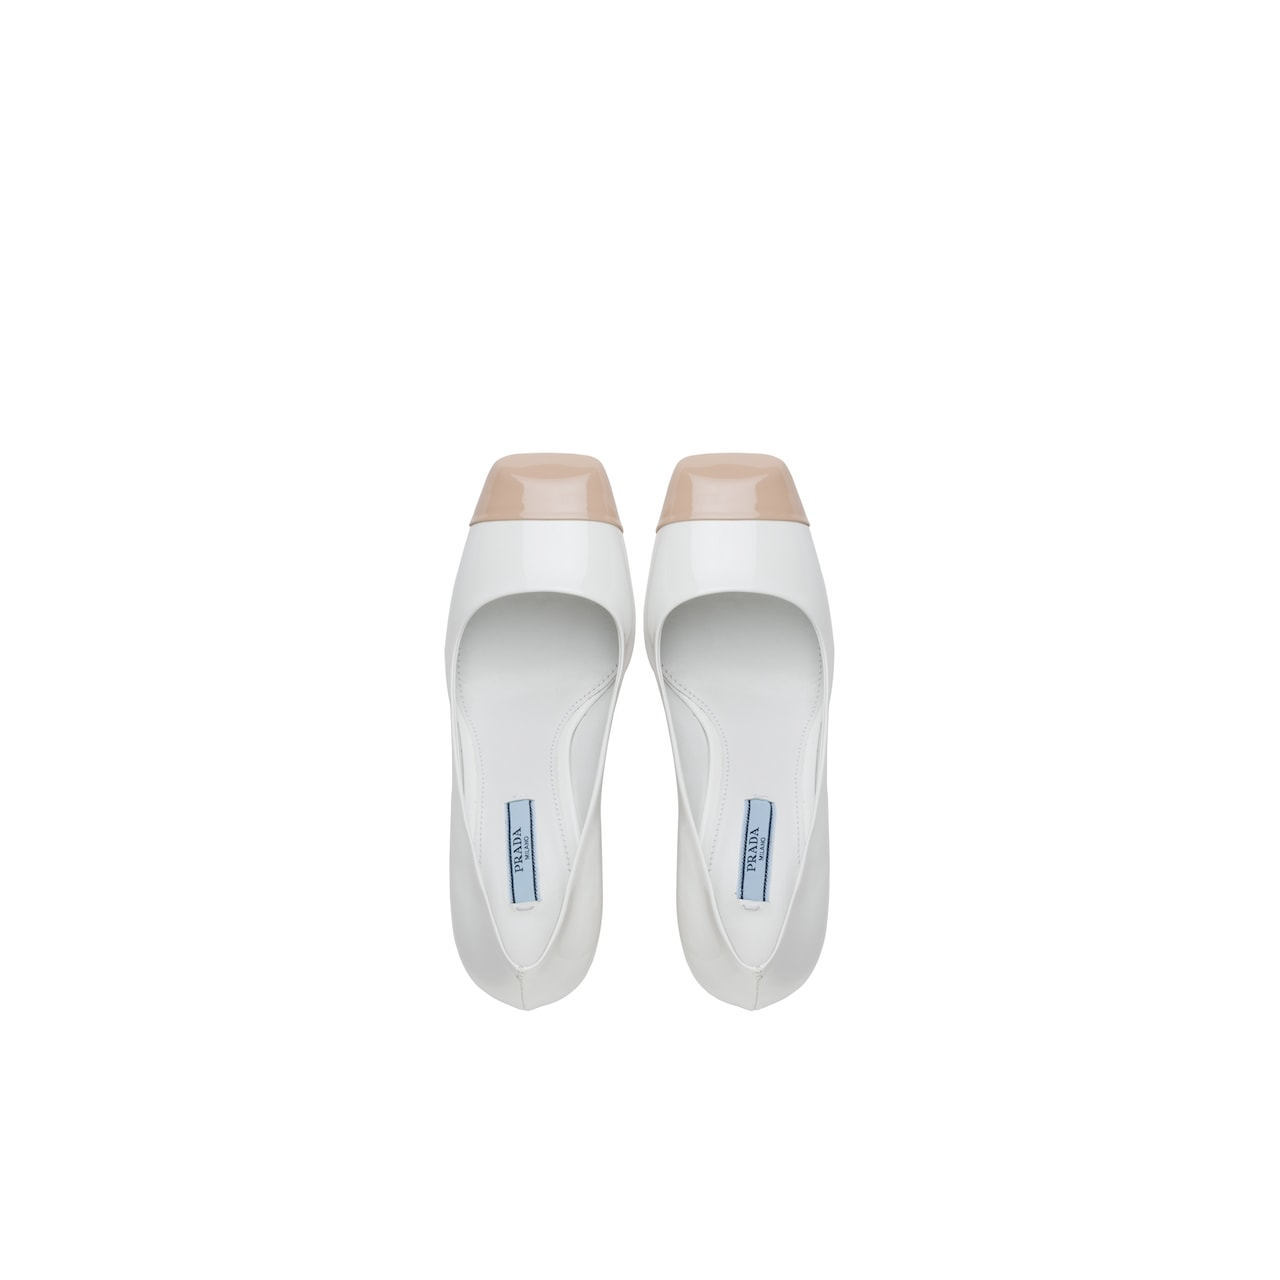 Prada 双色漆皮高跟鞋 4